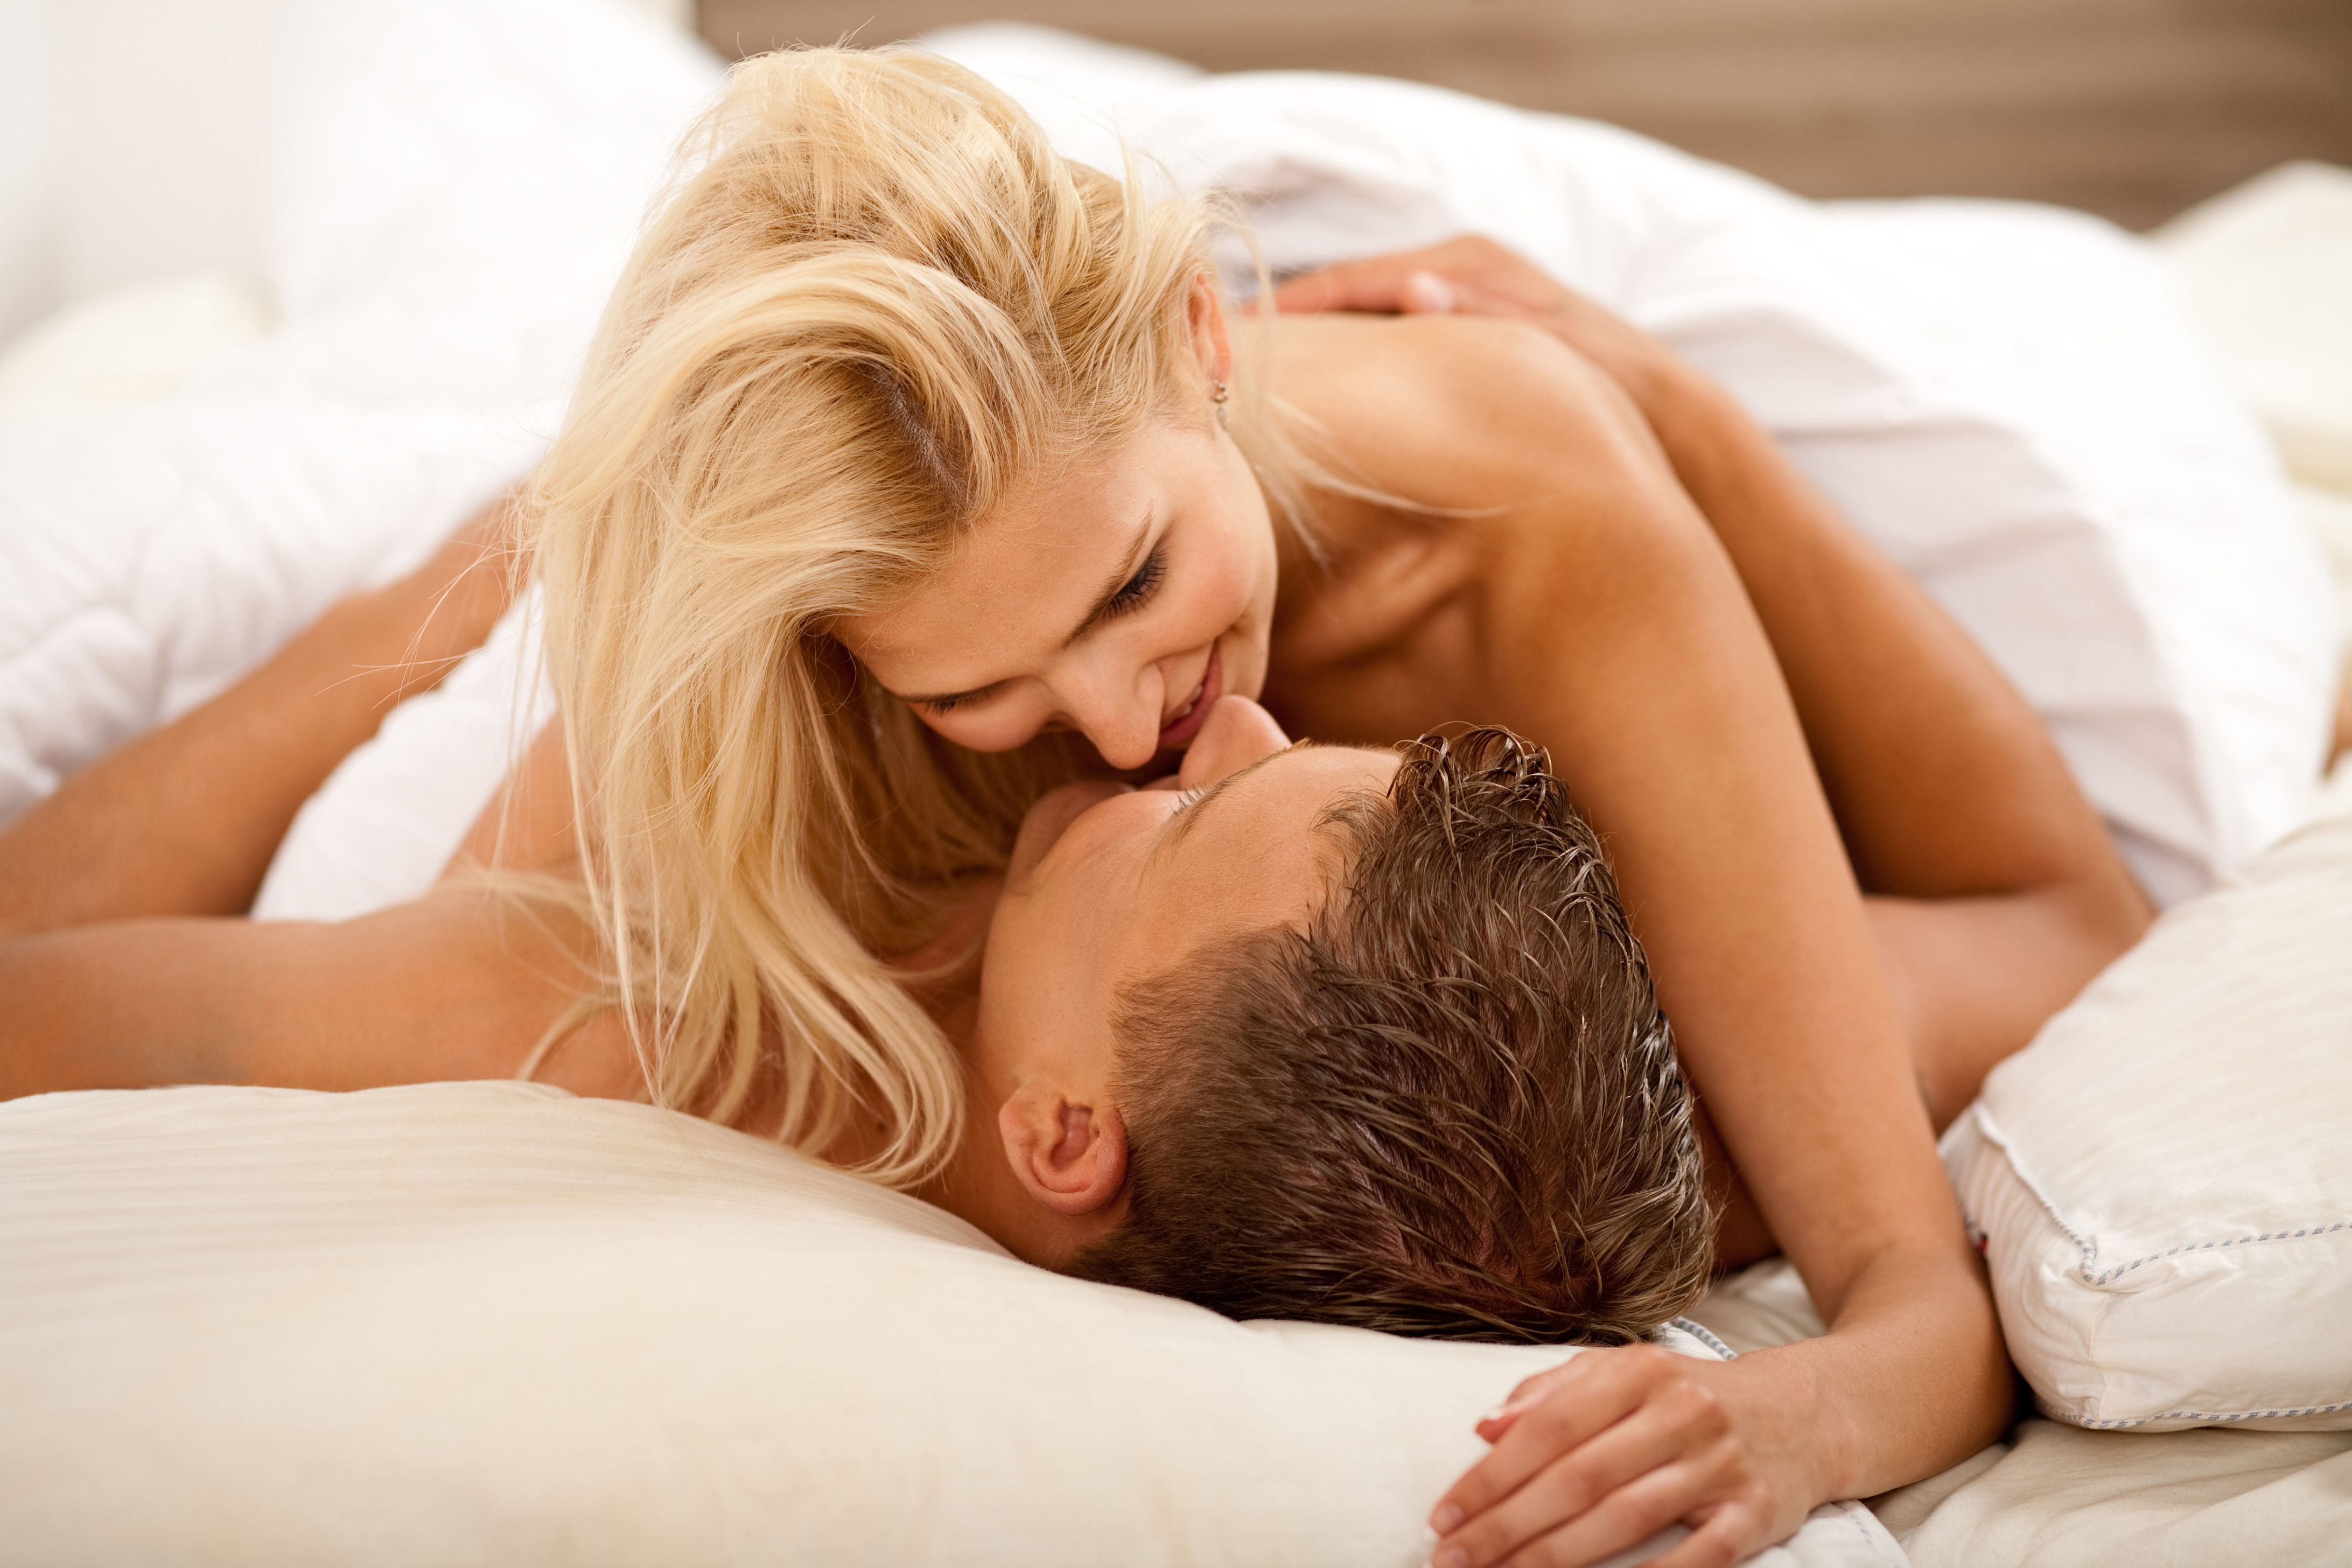 Советы сексопатолога онлайн 6 фотография